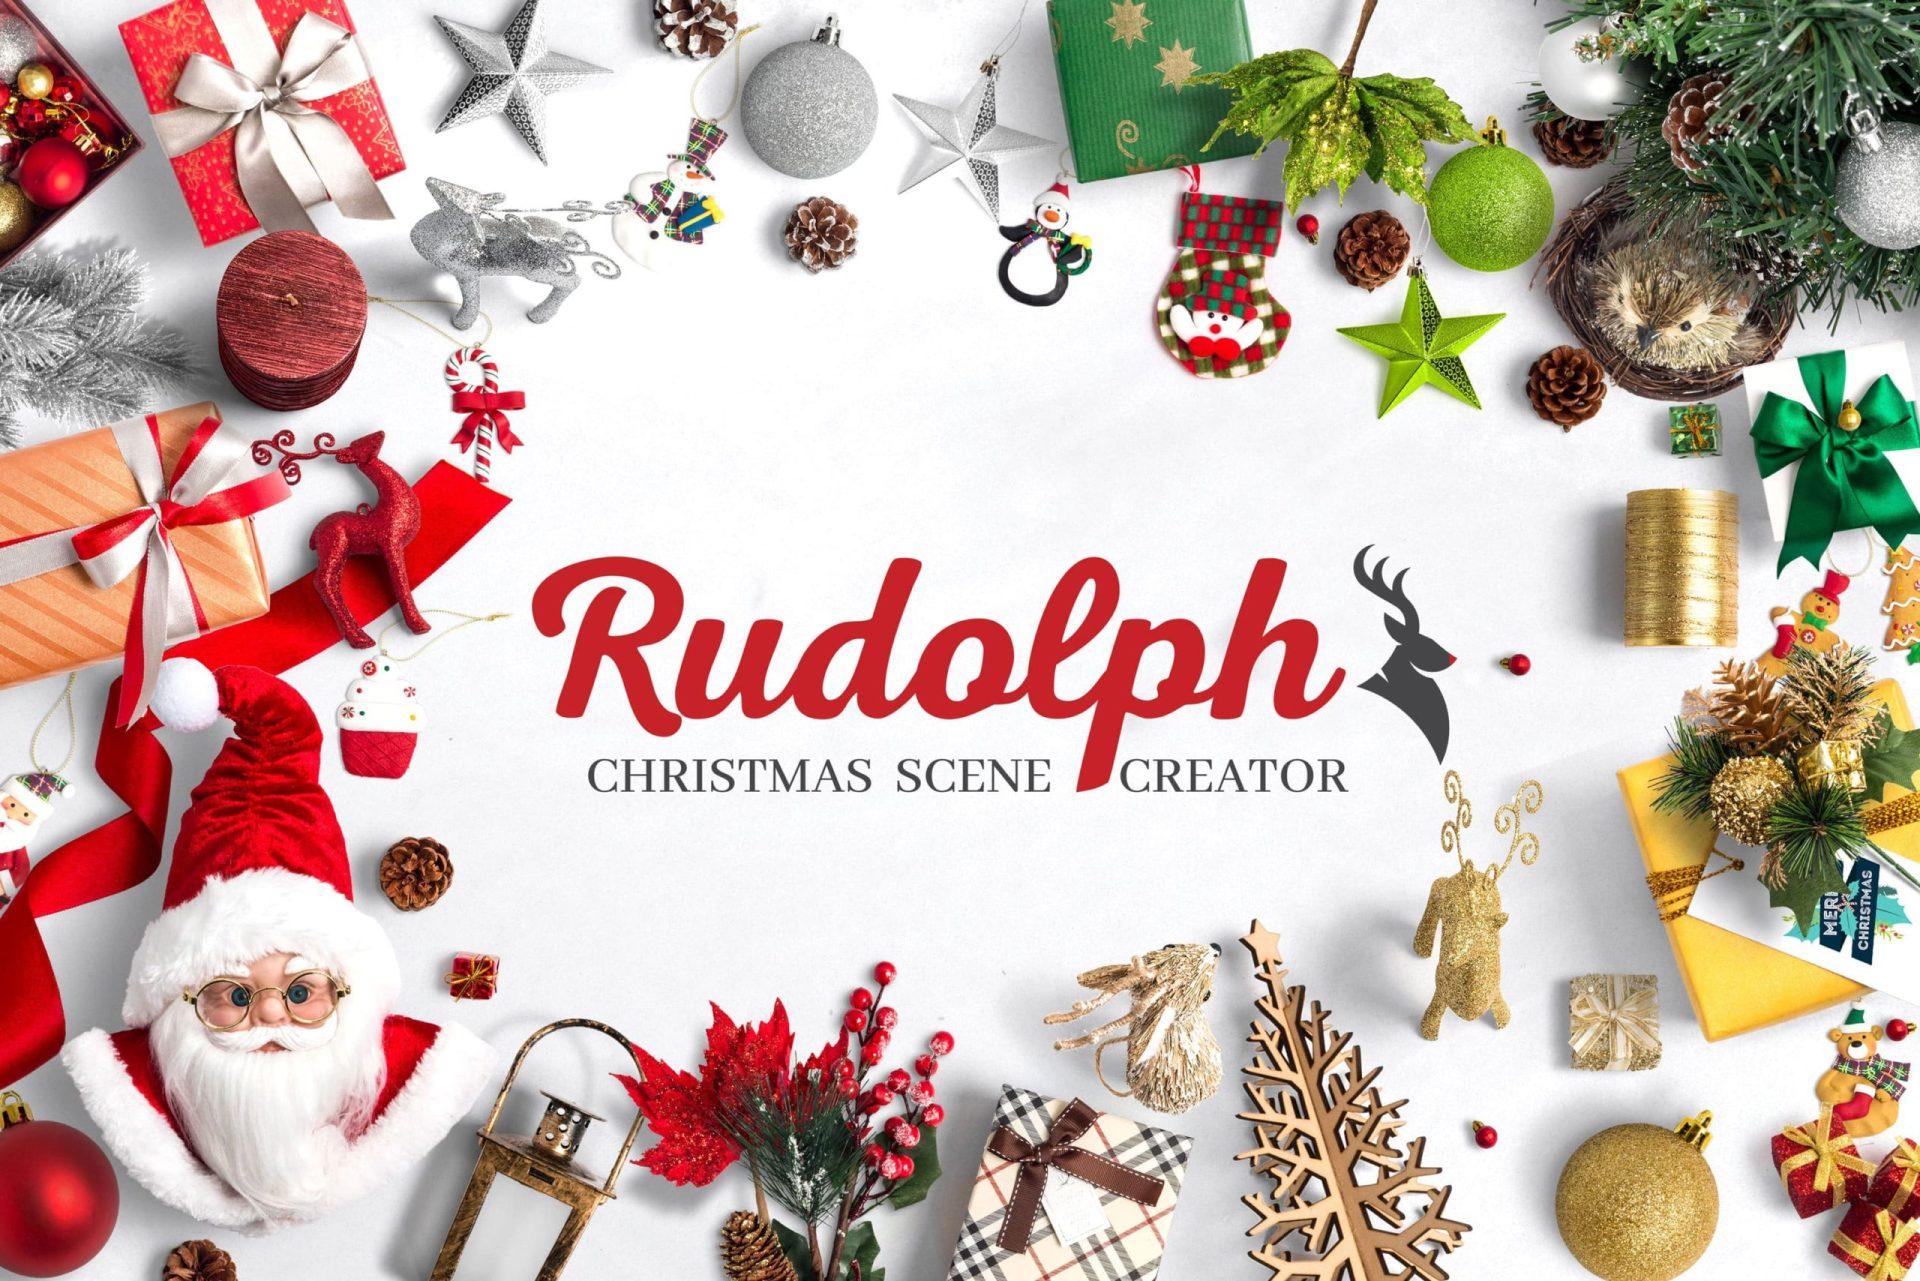 Rudolph Christmas Scene Creator